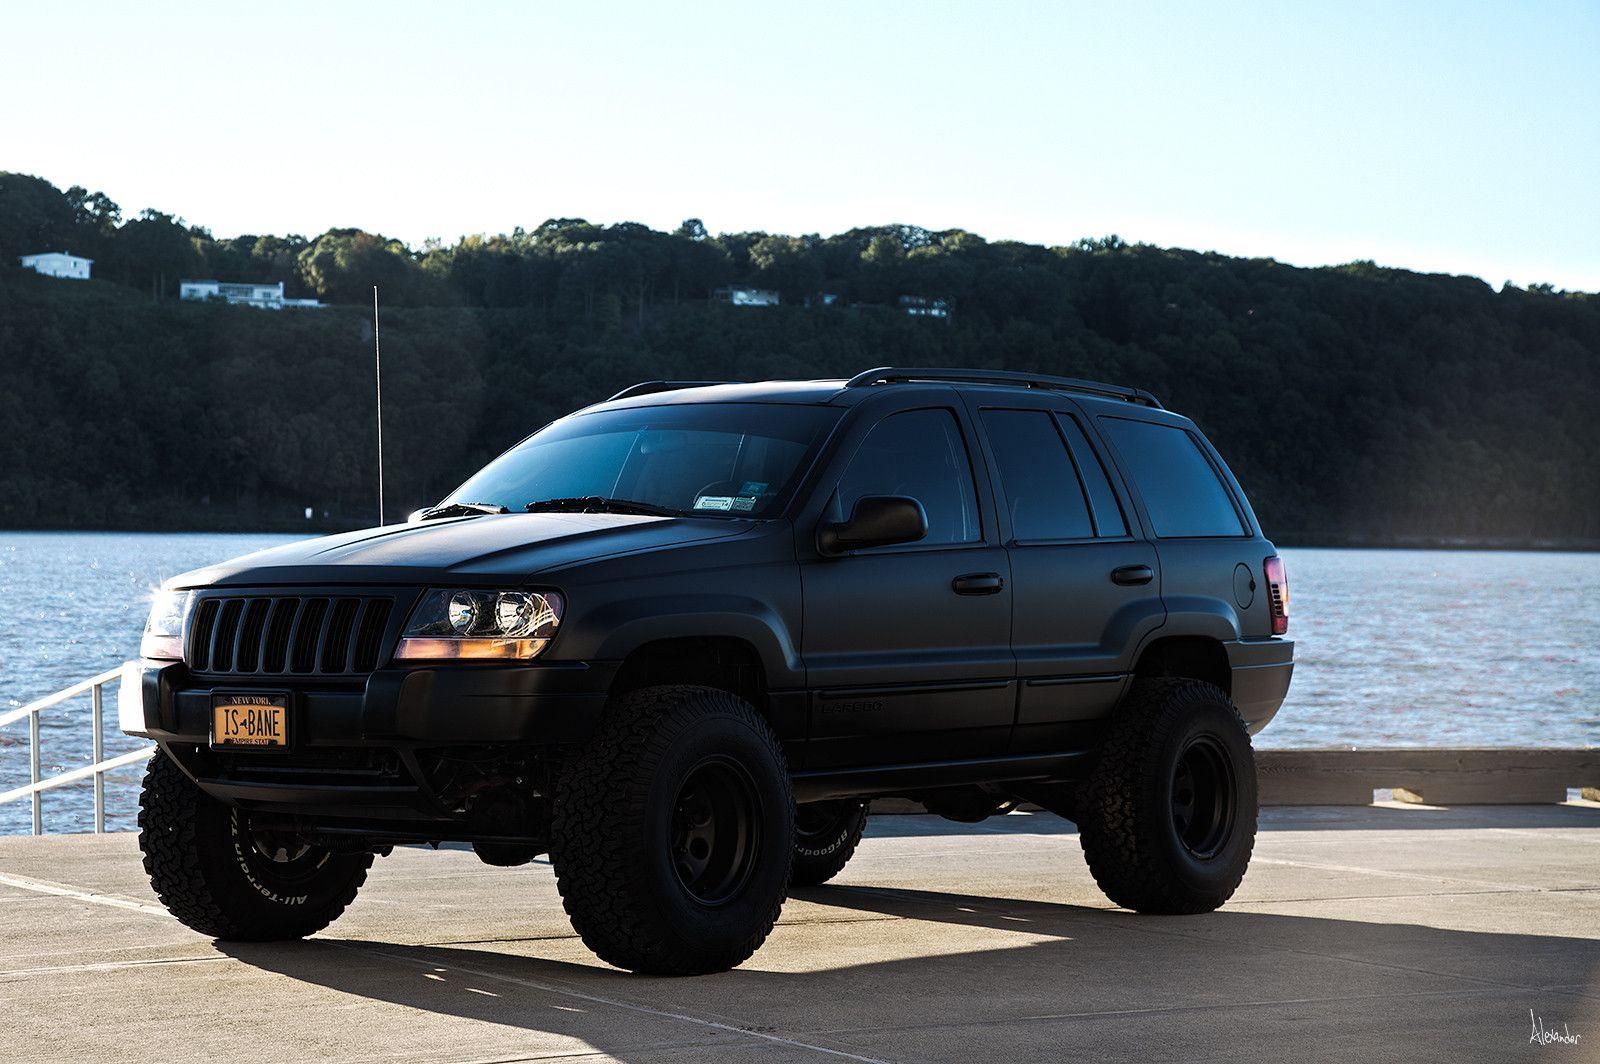 Matte Black Grand Cherokee Customed Jeep Wj Jeep Grand Cherokee